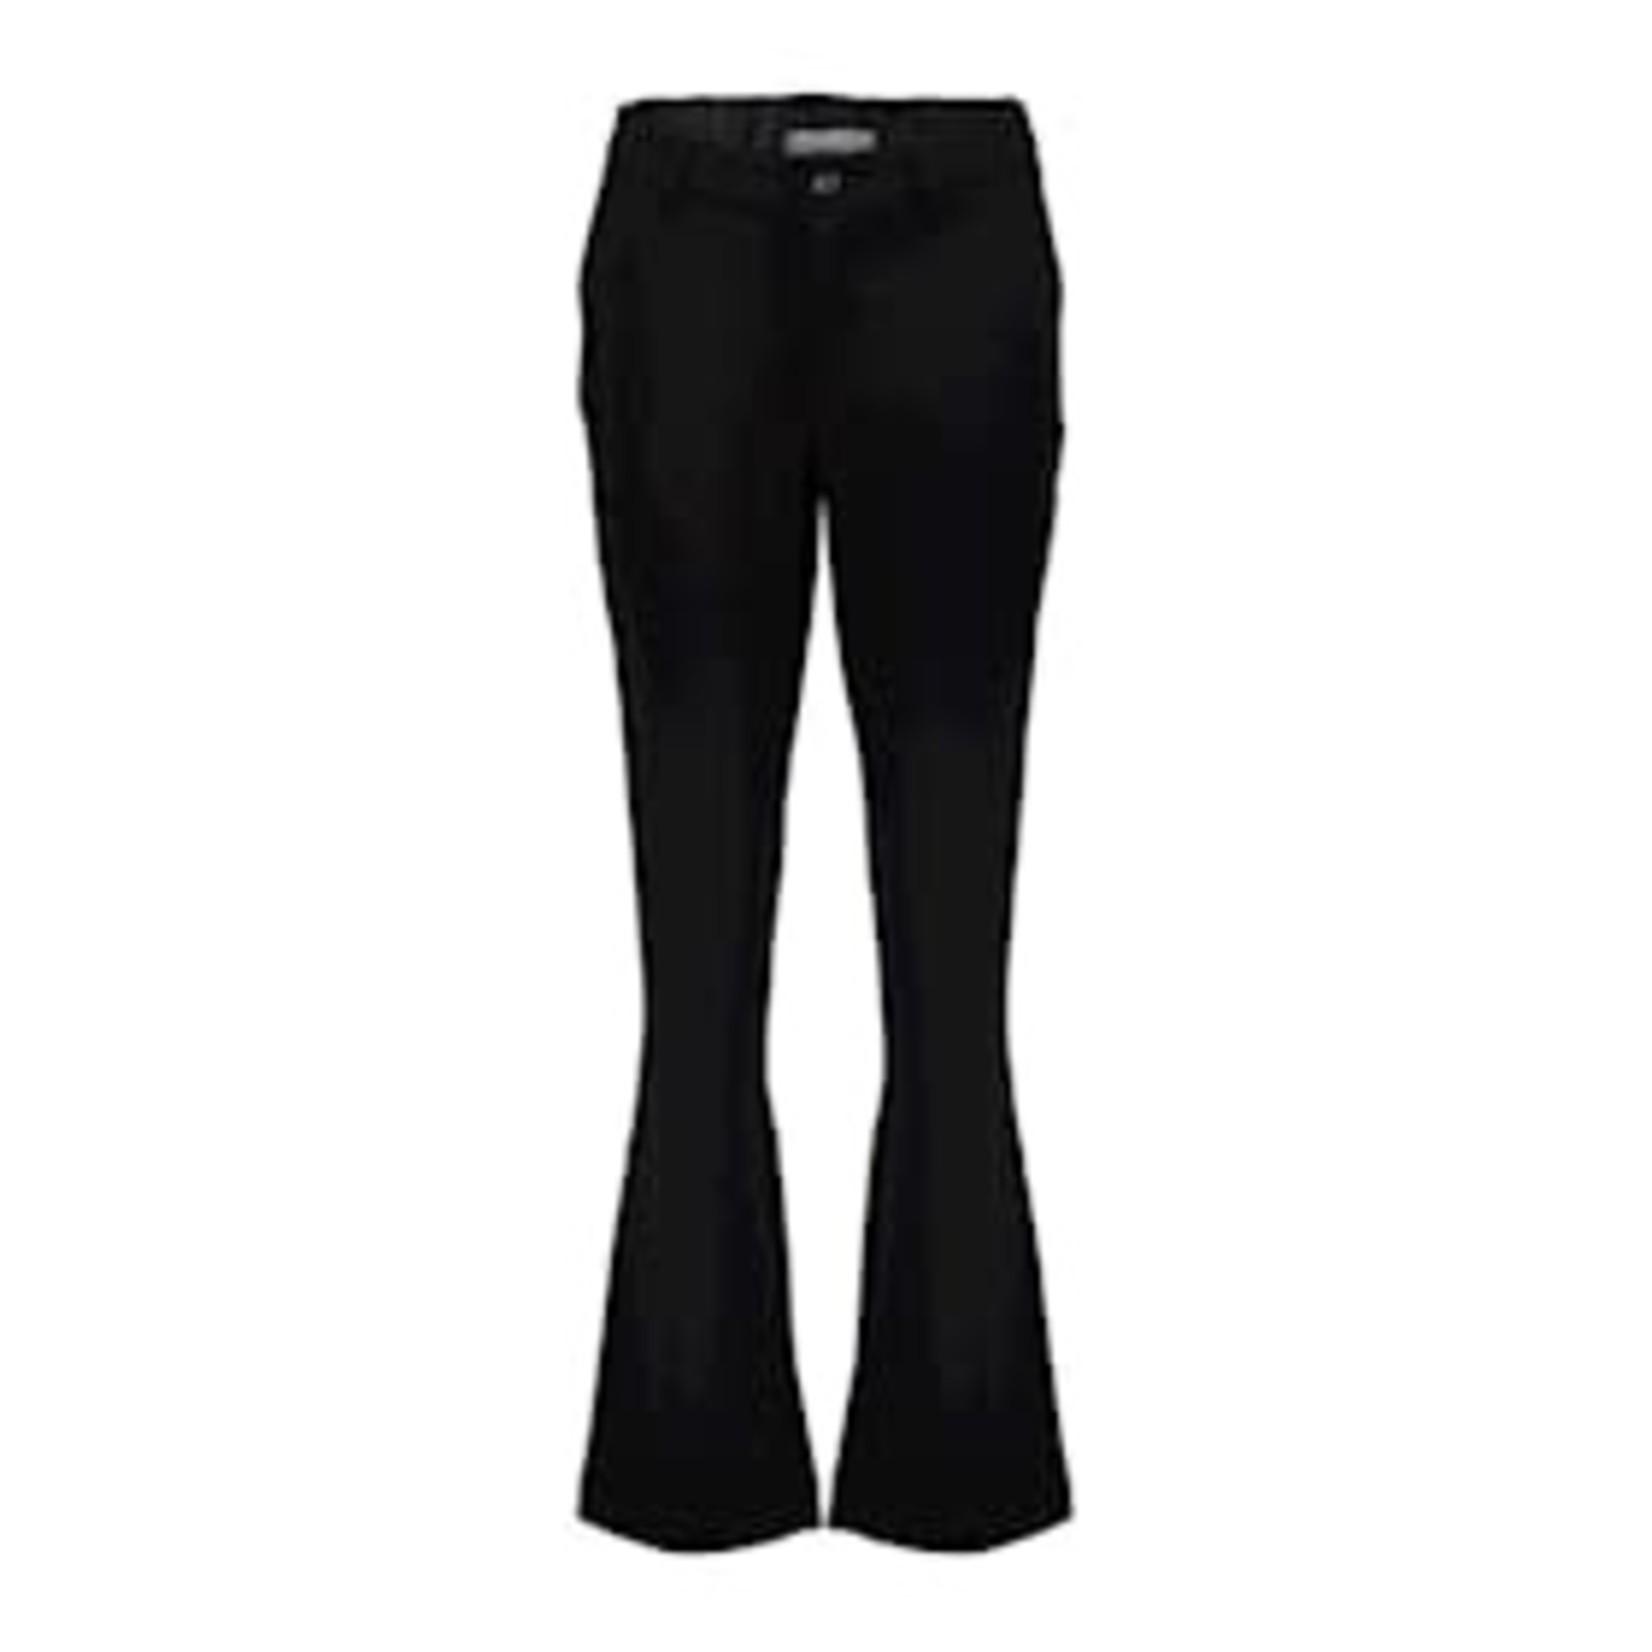 Geisha Geisha Pants Flair Black 11508-10